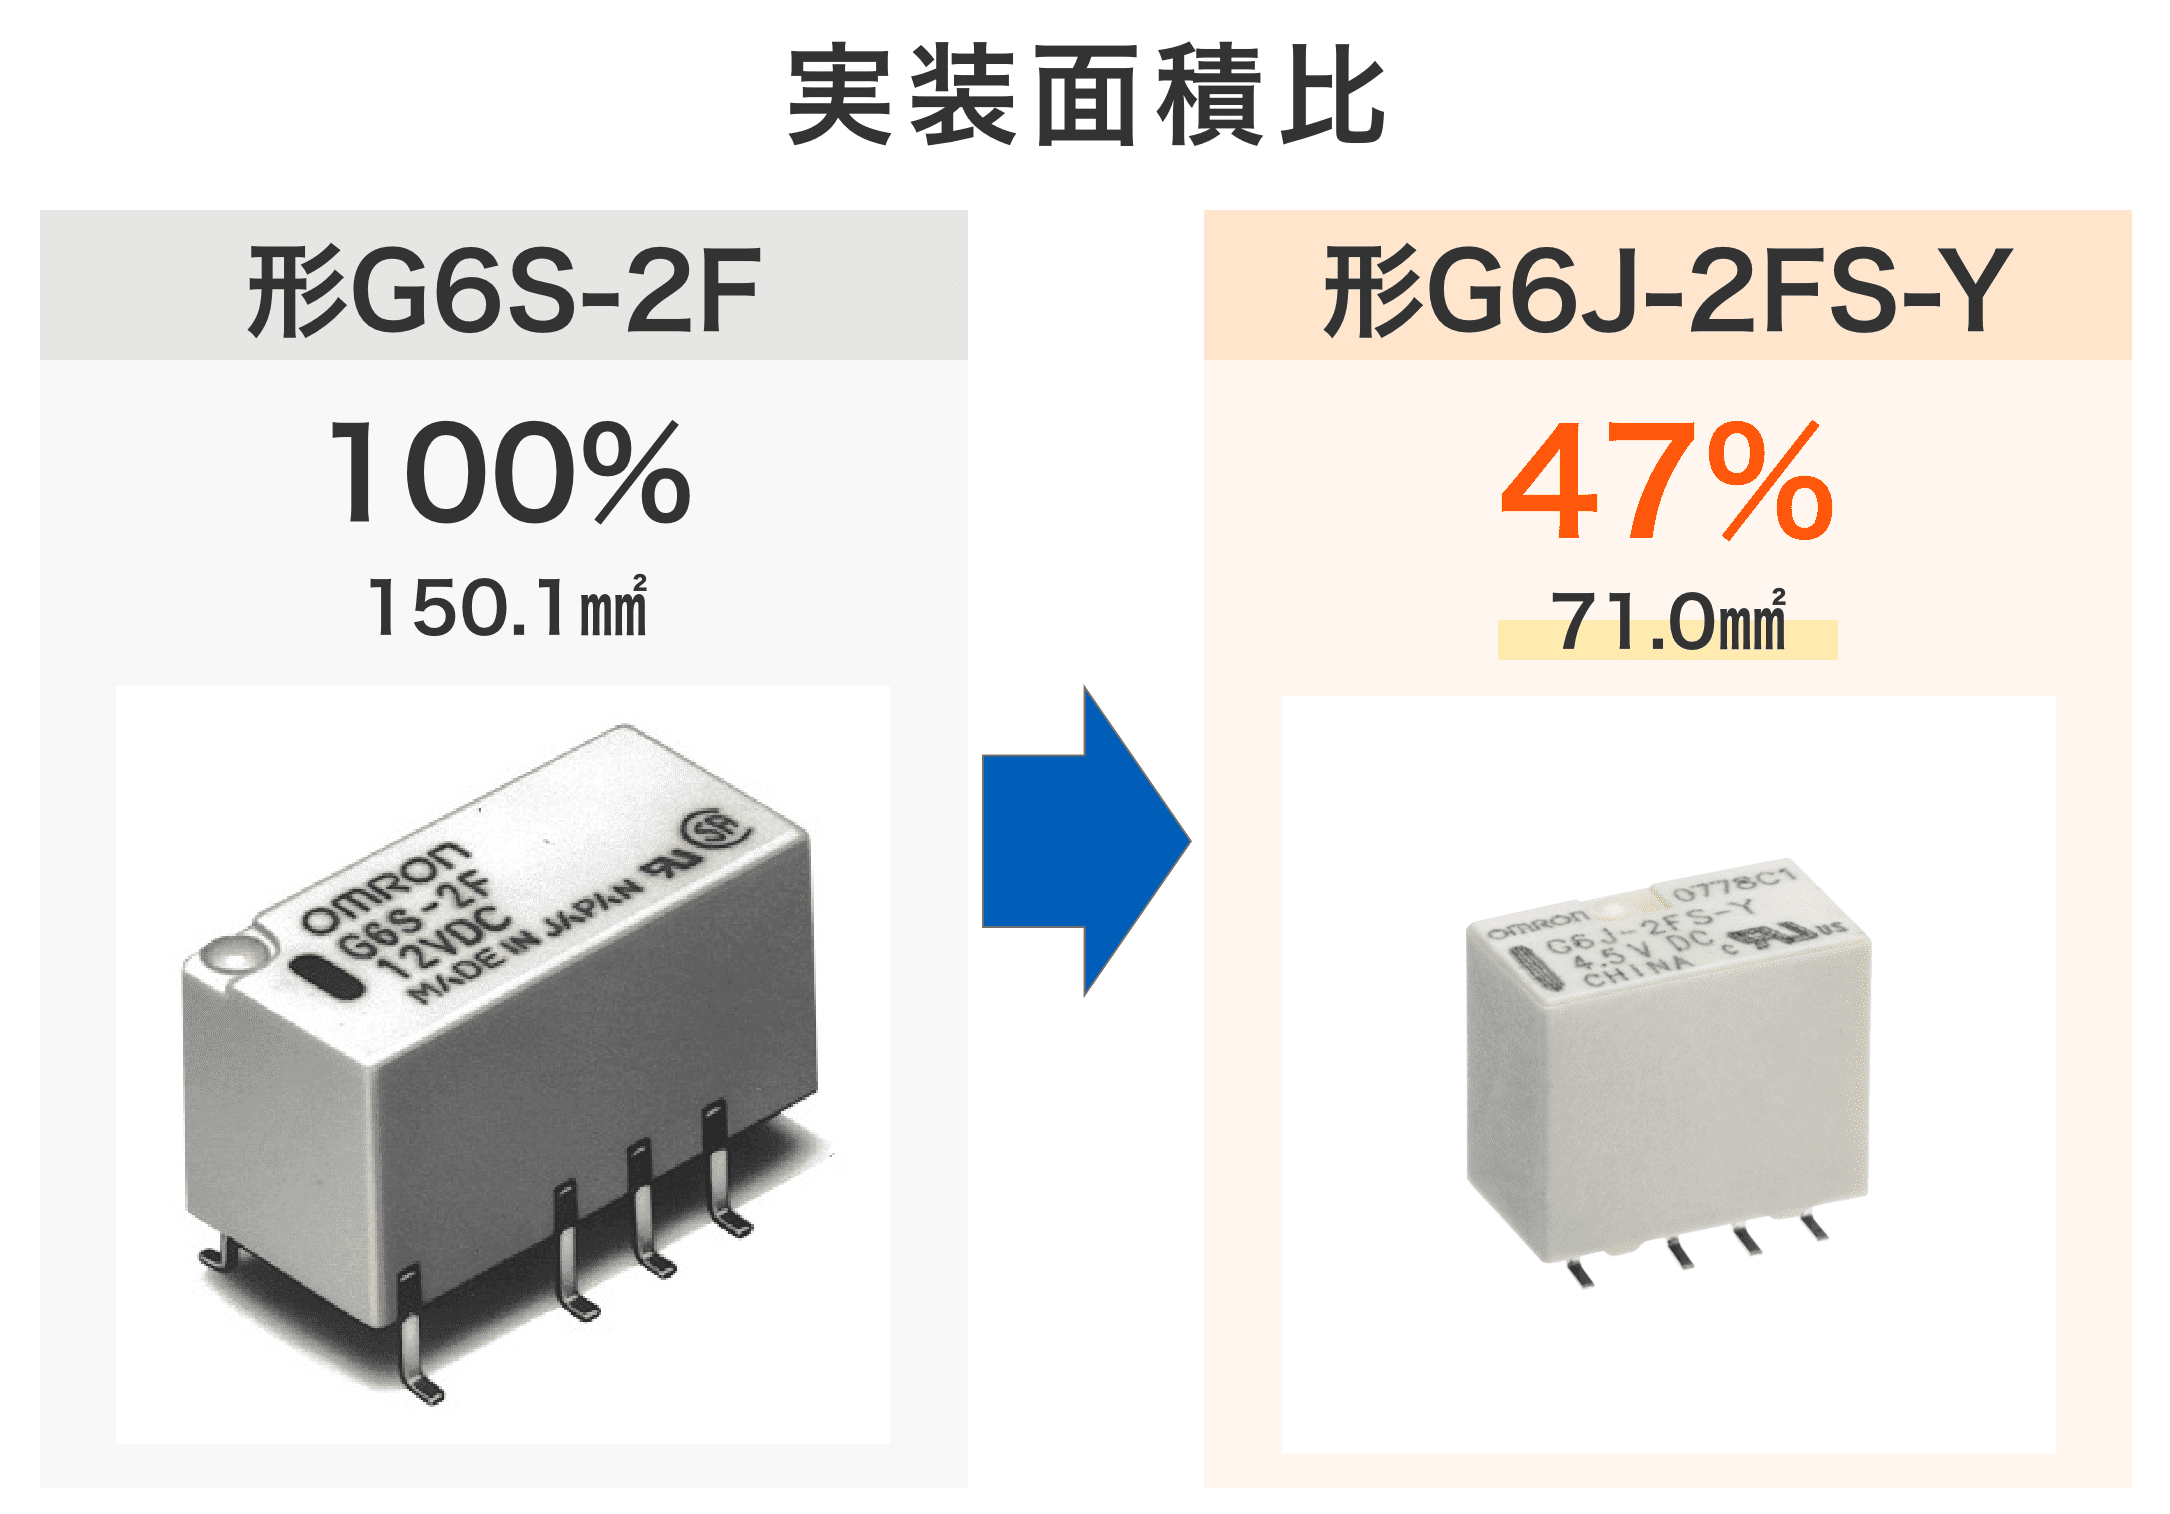 実装面積比:形G6S-2F 100% 150.1mm2 / 形G6J-2FS-Y 47% 71.0mm2